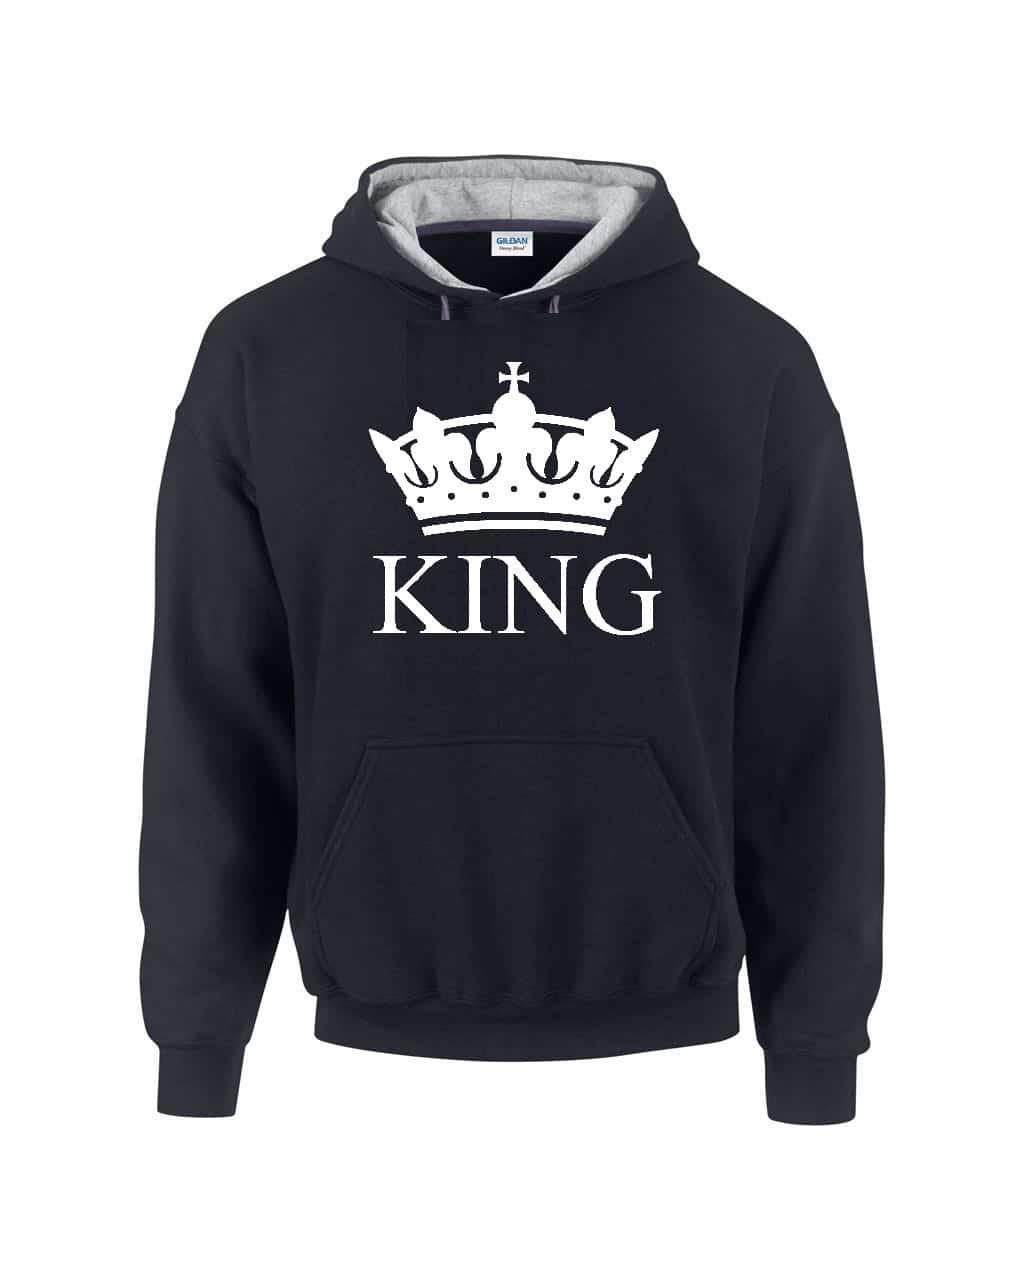 King kapucnis pulóver  f4342dc8df